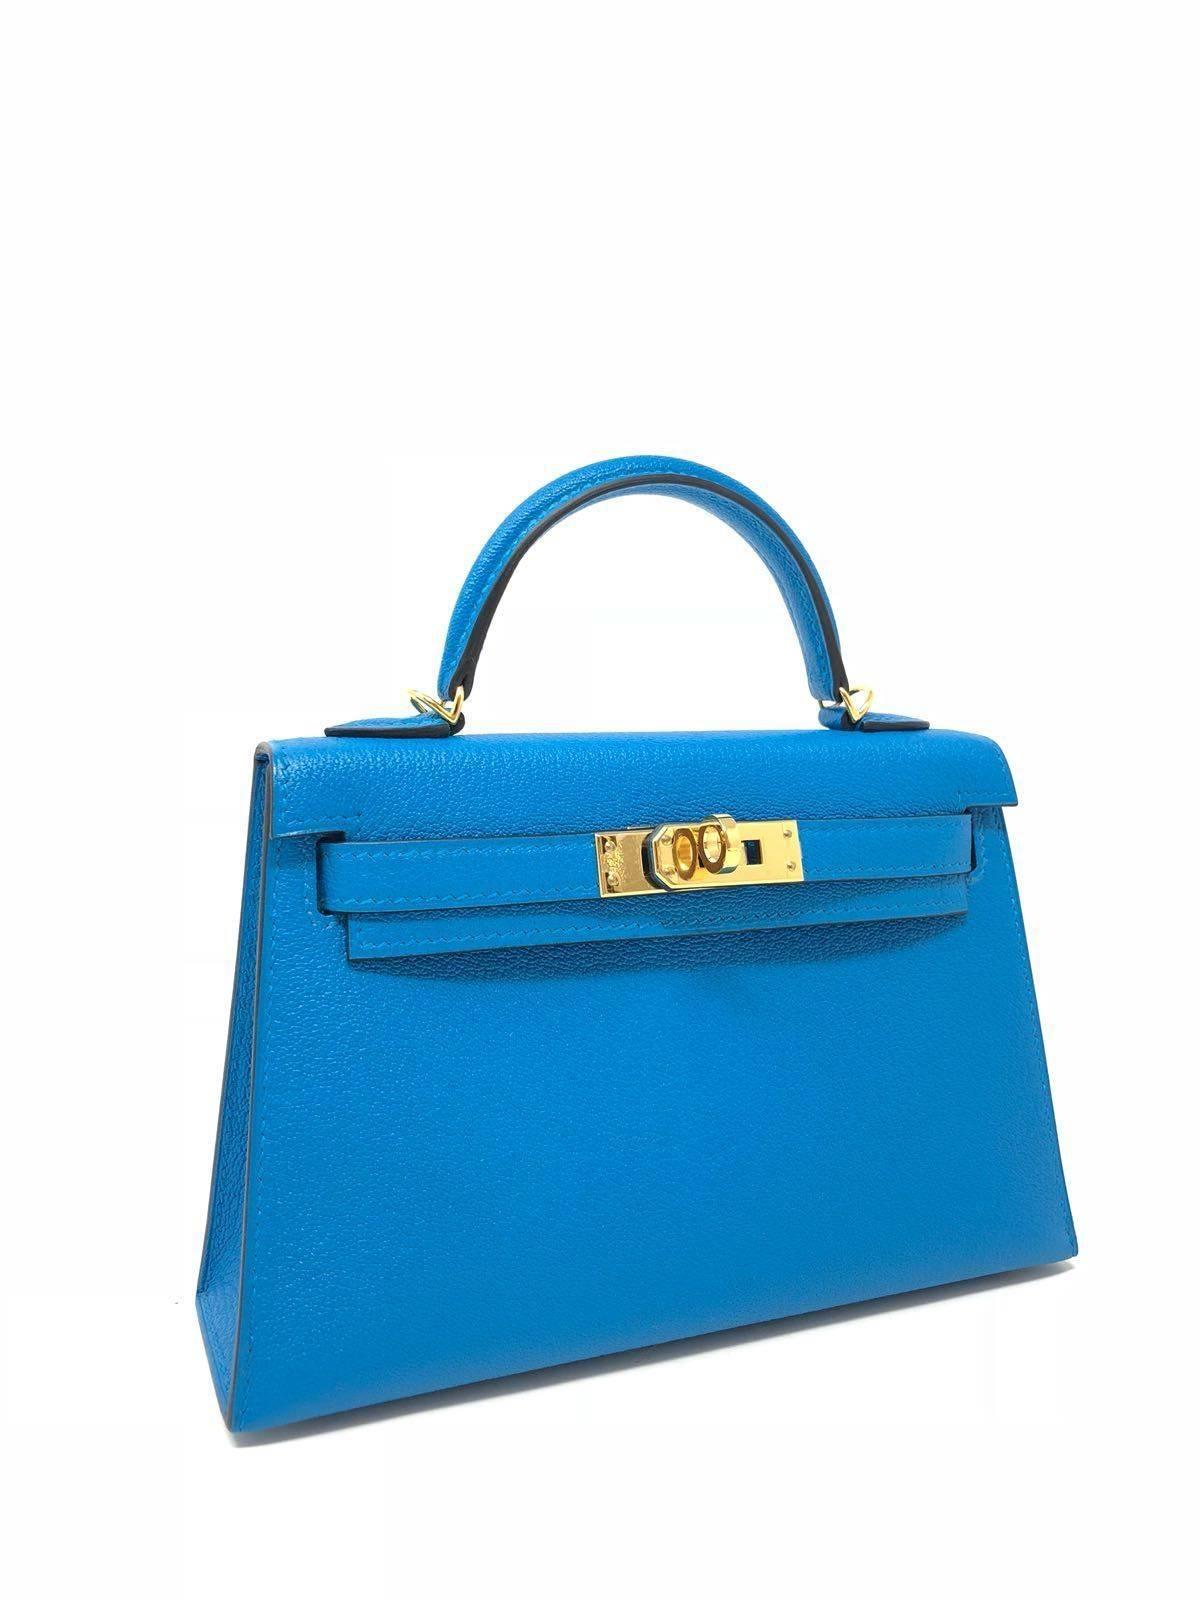 d5d1f4466506 ... buy hermes kelly bag 20 mini kelly ii blue zanzibar chevre leather.  this jewel tone ...